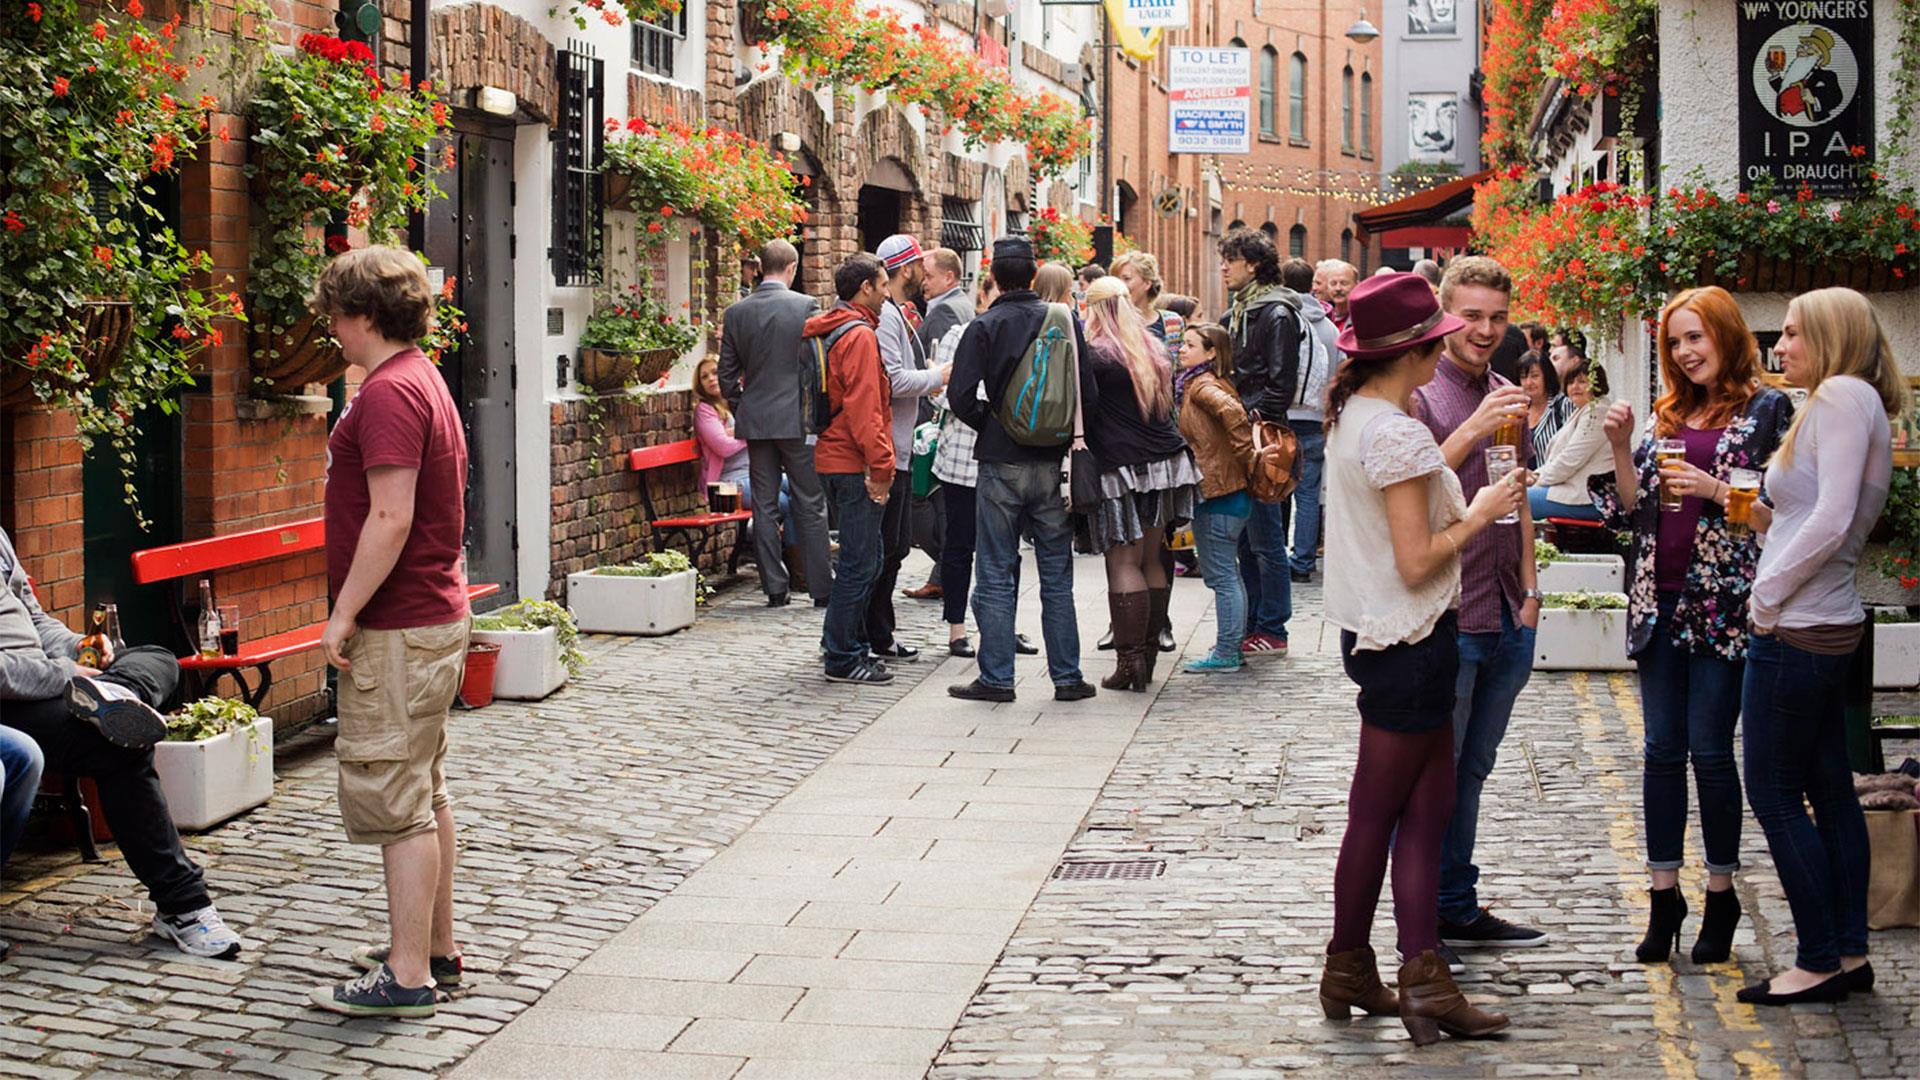 UK: Cross-Border Revellers from Ireland pack Belfast Pubs as Dublin Halts Re-Openings